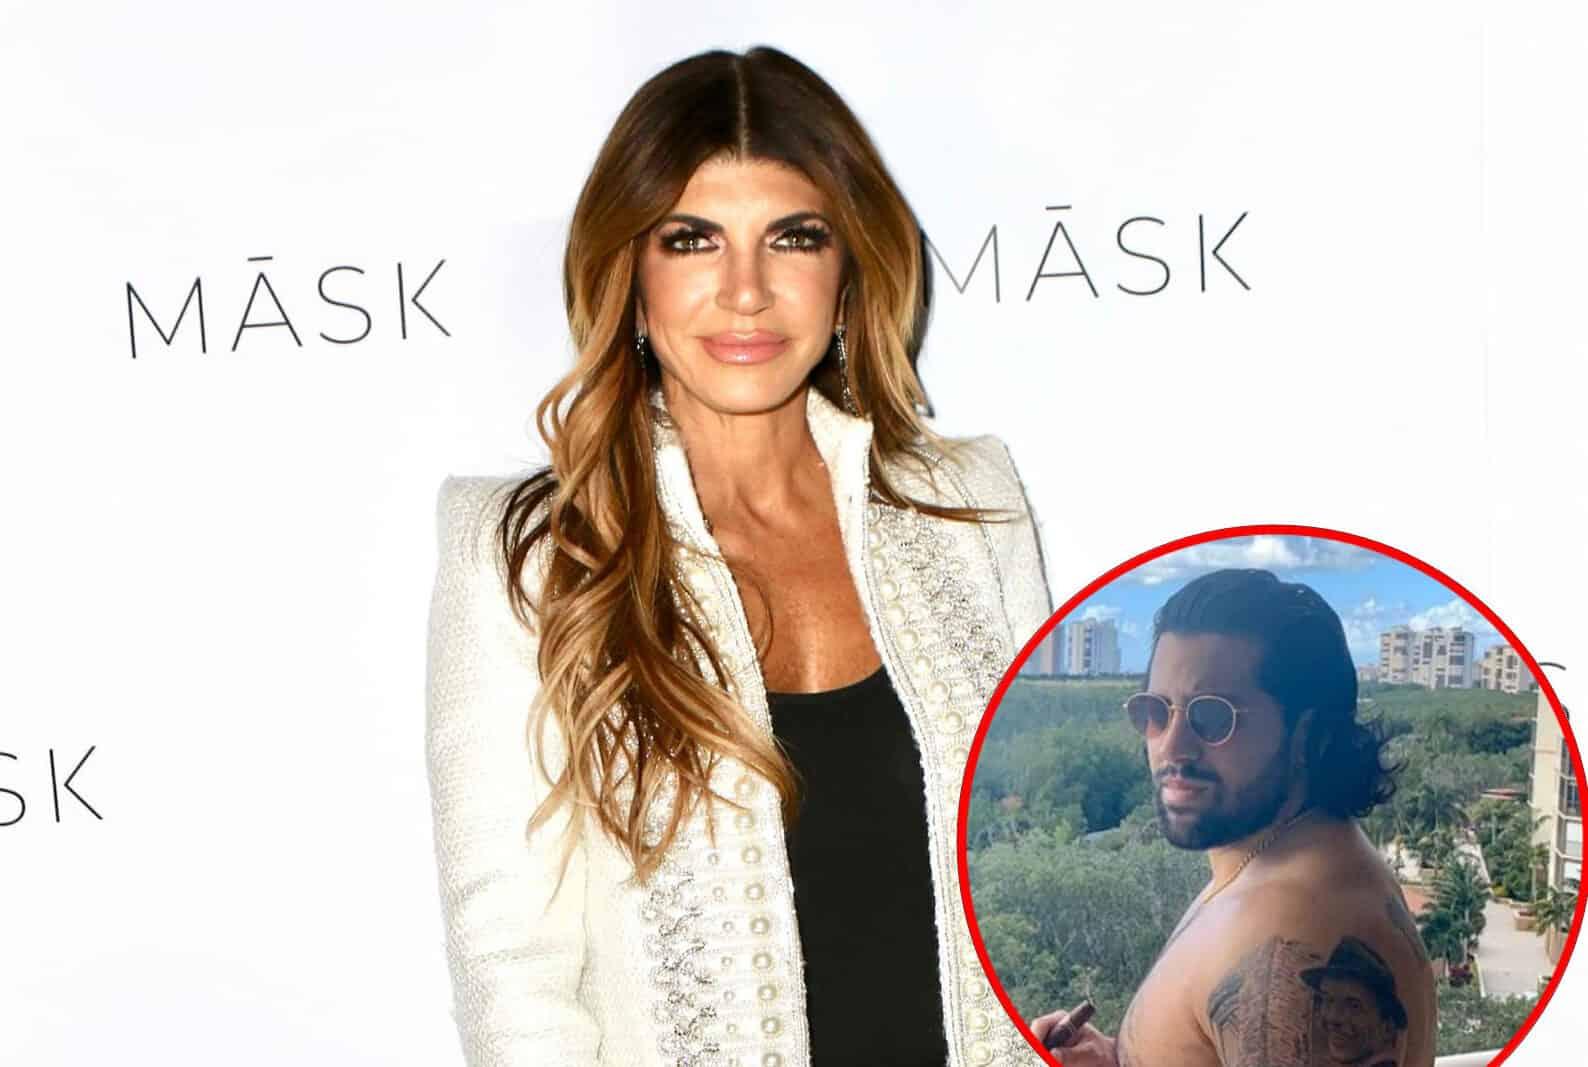 PHOTOS: RHONJ Star Teresa Giudice Caught Flirting With Sports Agent Joe D'Amelio on Instagram! Hints at Secret Getaway Months After Splitting From Husband Joe